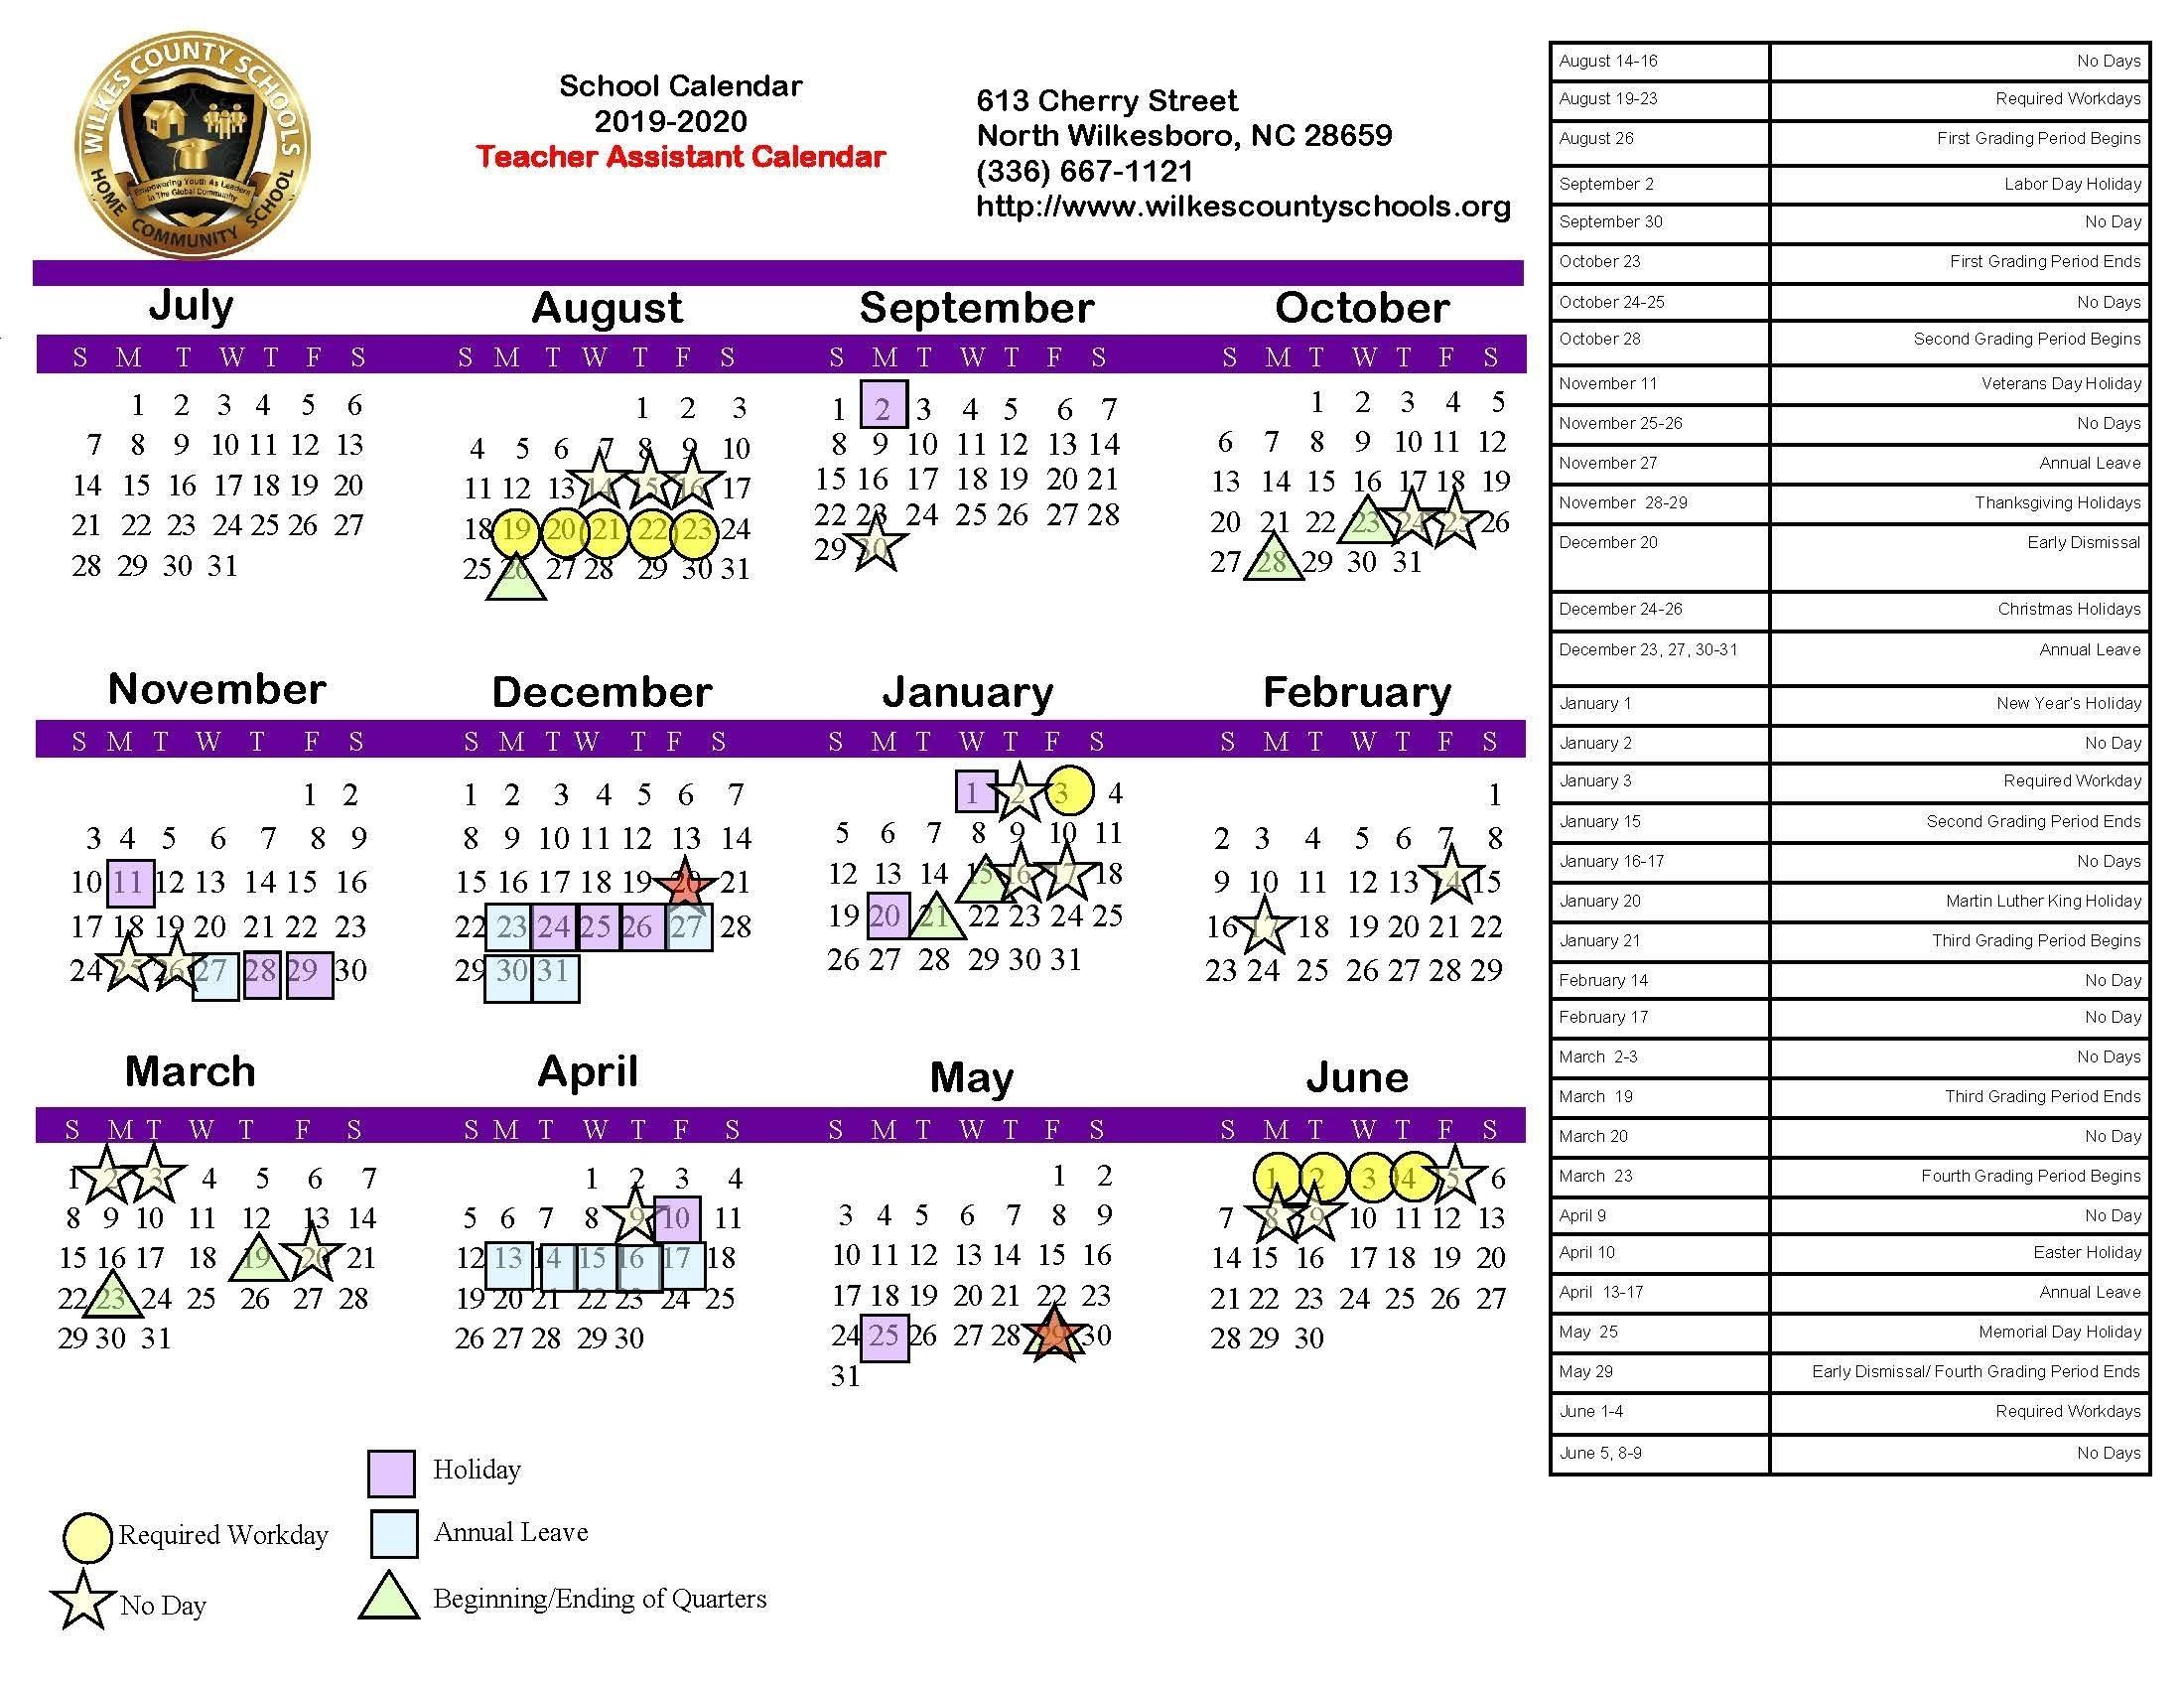 U Of M Calendar 2019-2020 School Year | Calendar Template regarding U Of M 2019 2020 Calendar